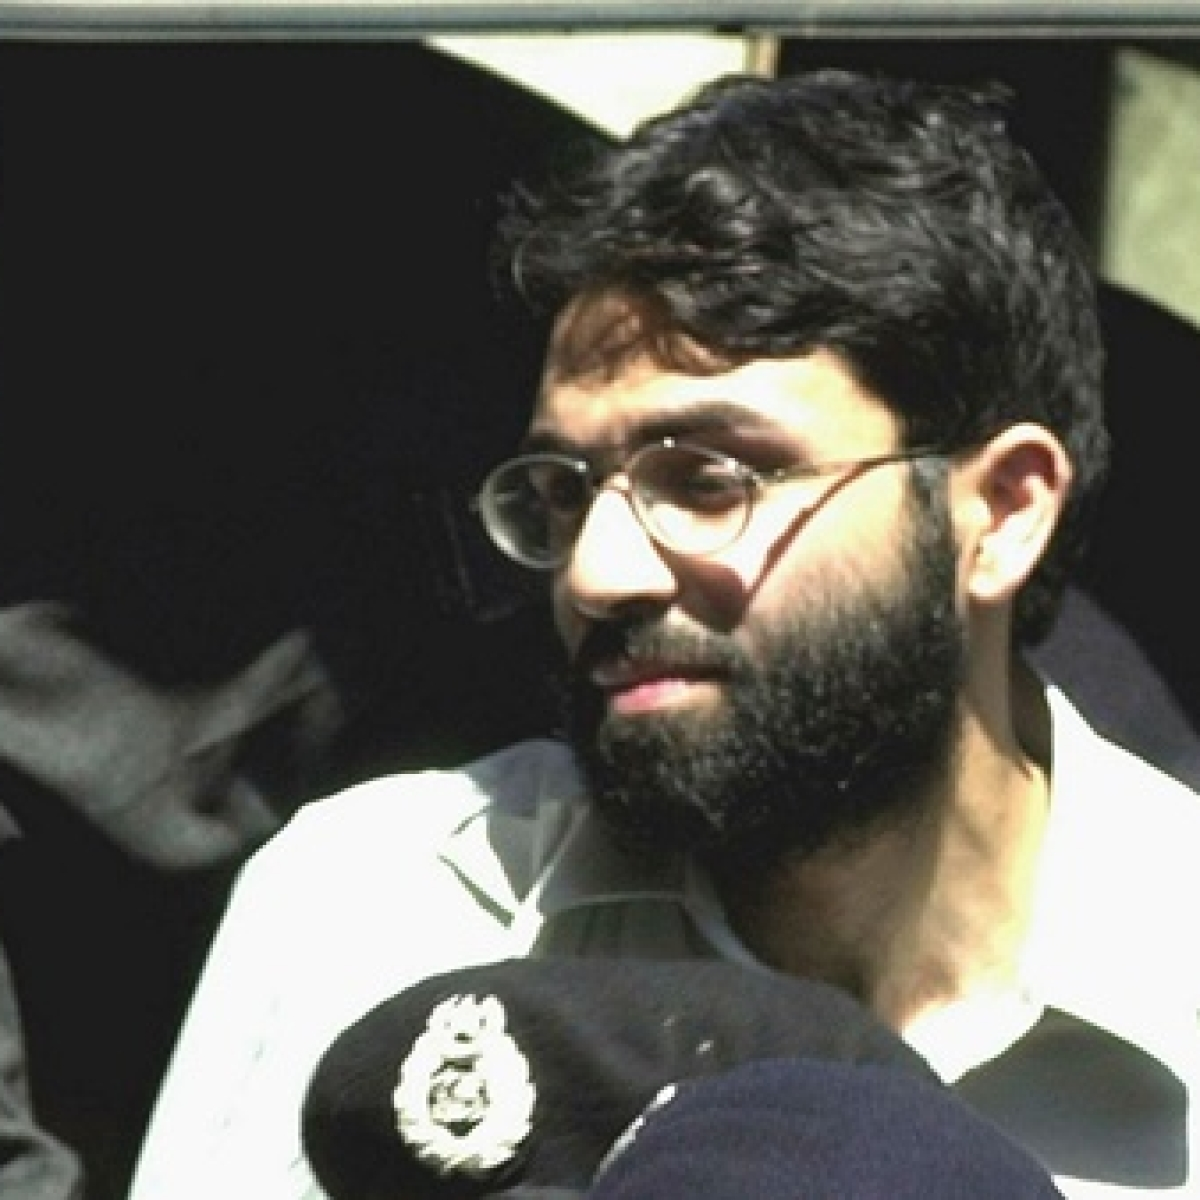 US journalist Daniel Pearl case verdict may hit Pakistan hard